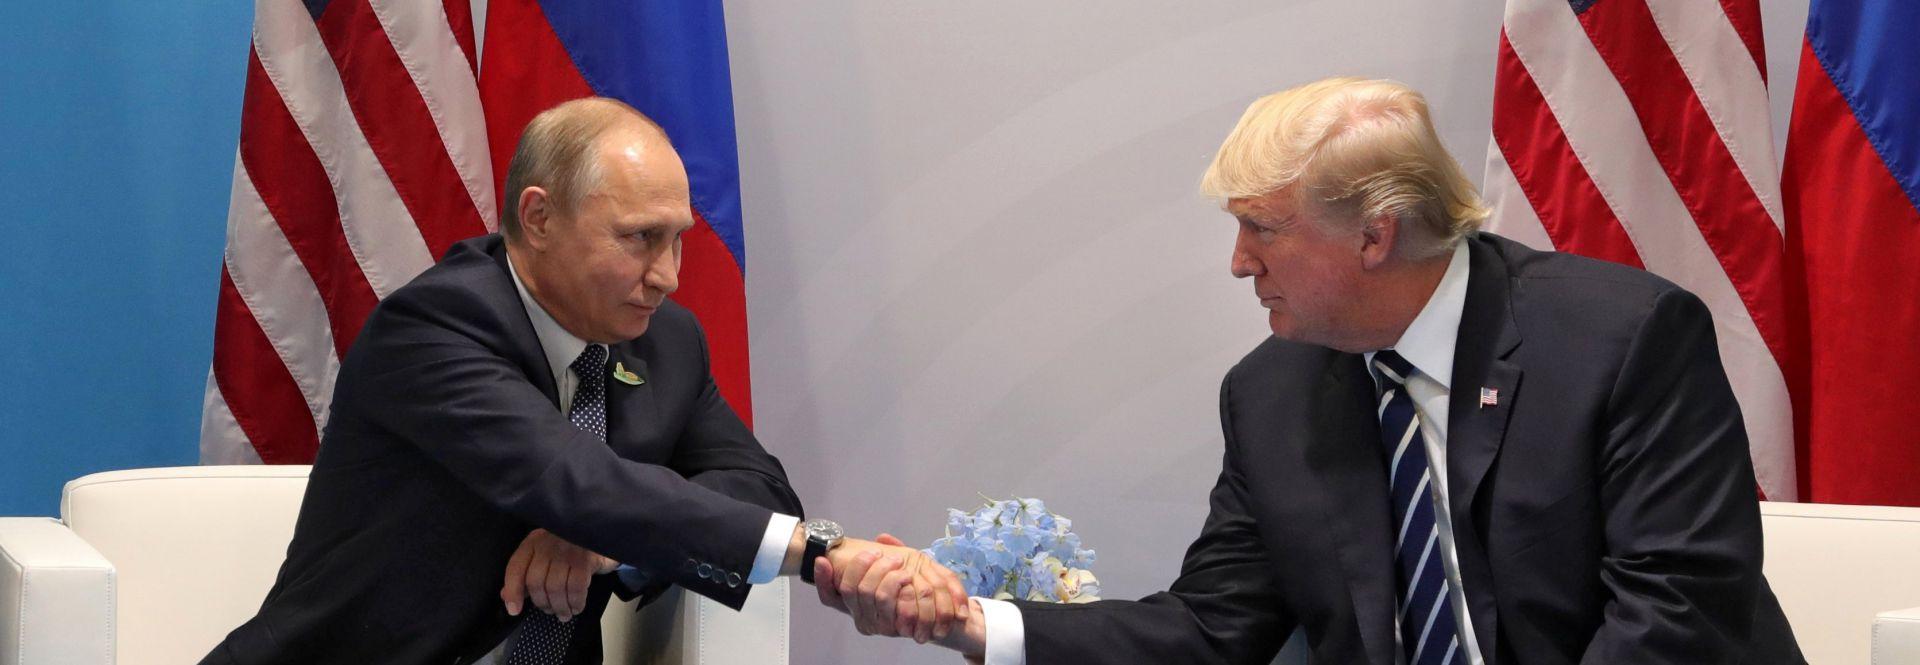 La pataleta de Trump con Rusia